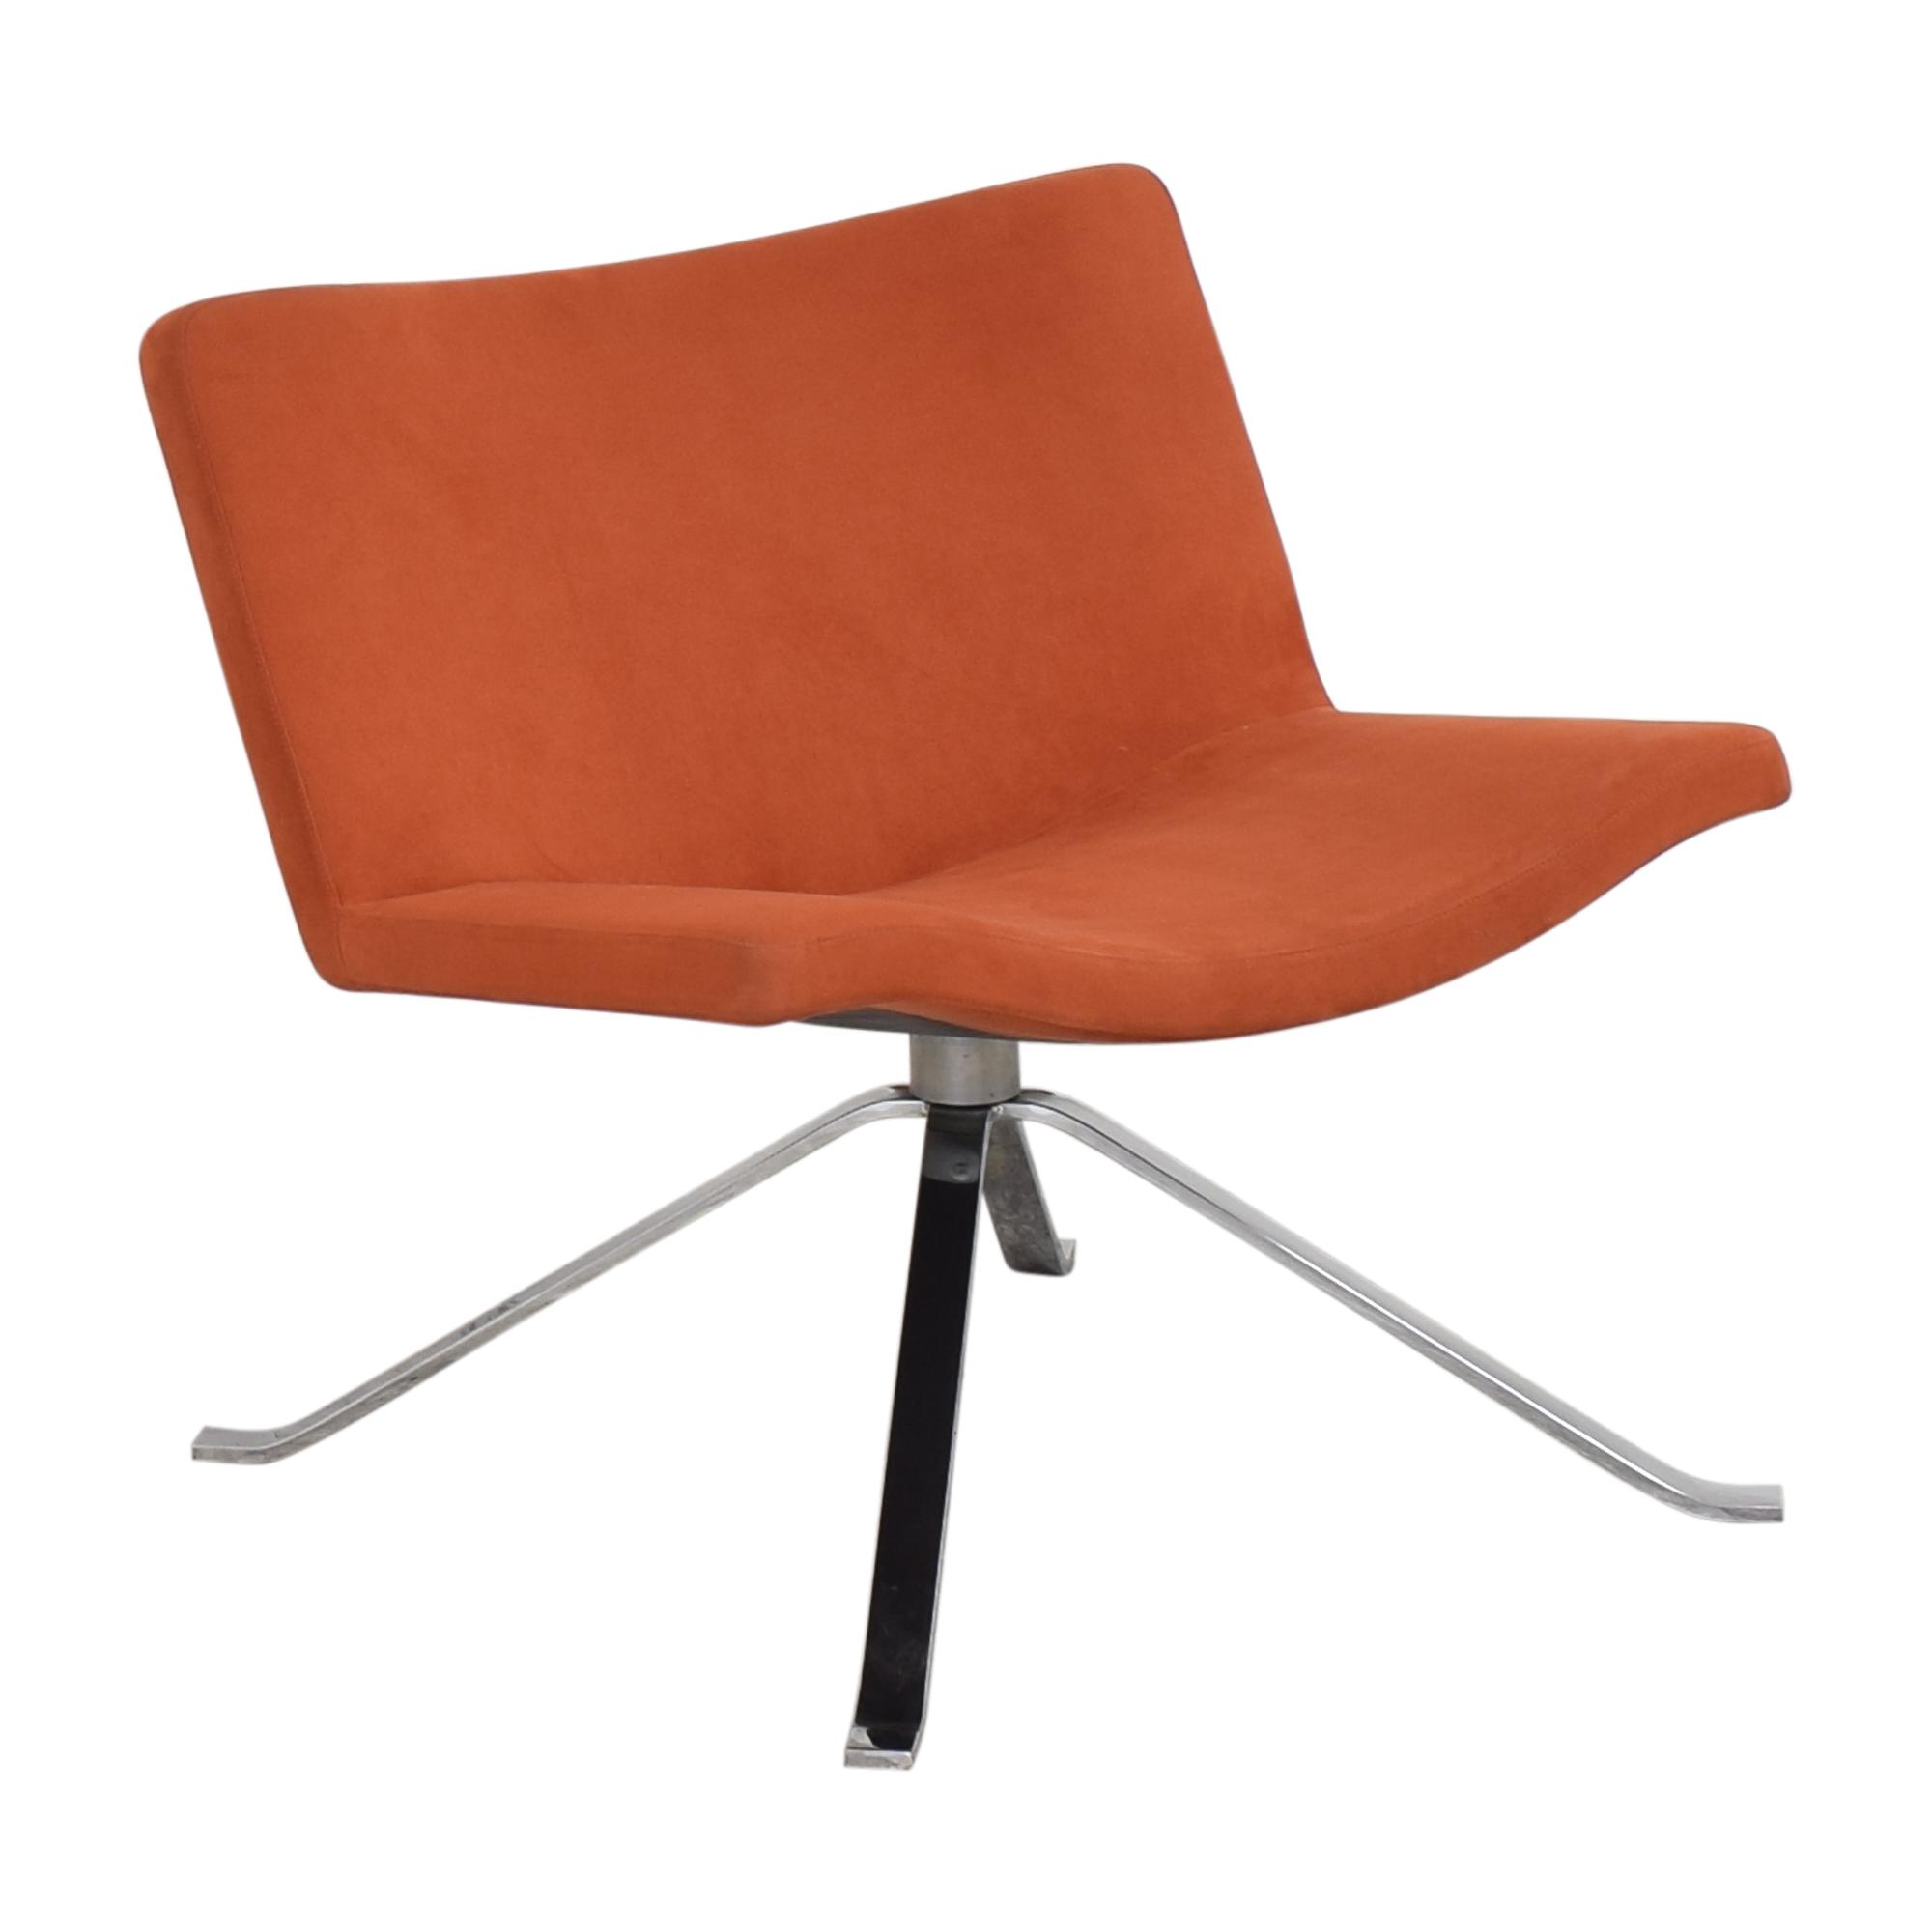 Tonon Tonon Wave Lounge Spider Base Chair pa